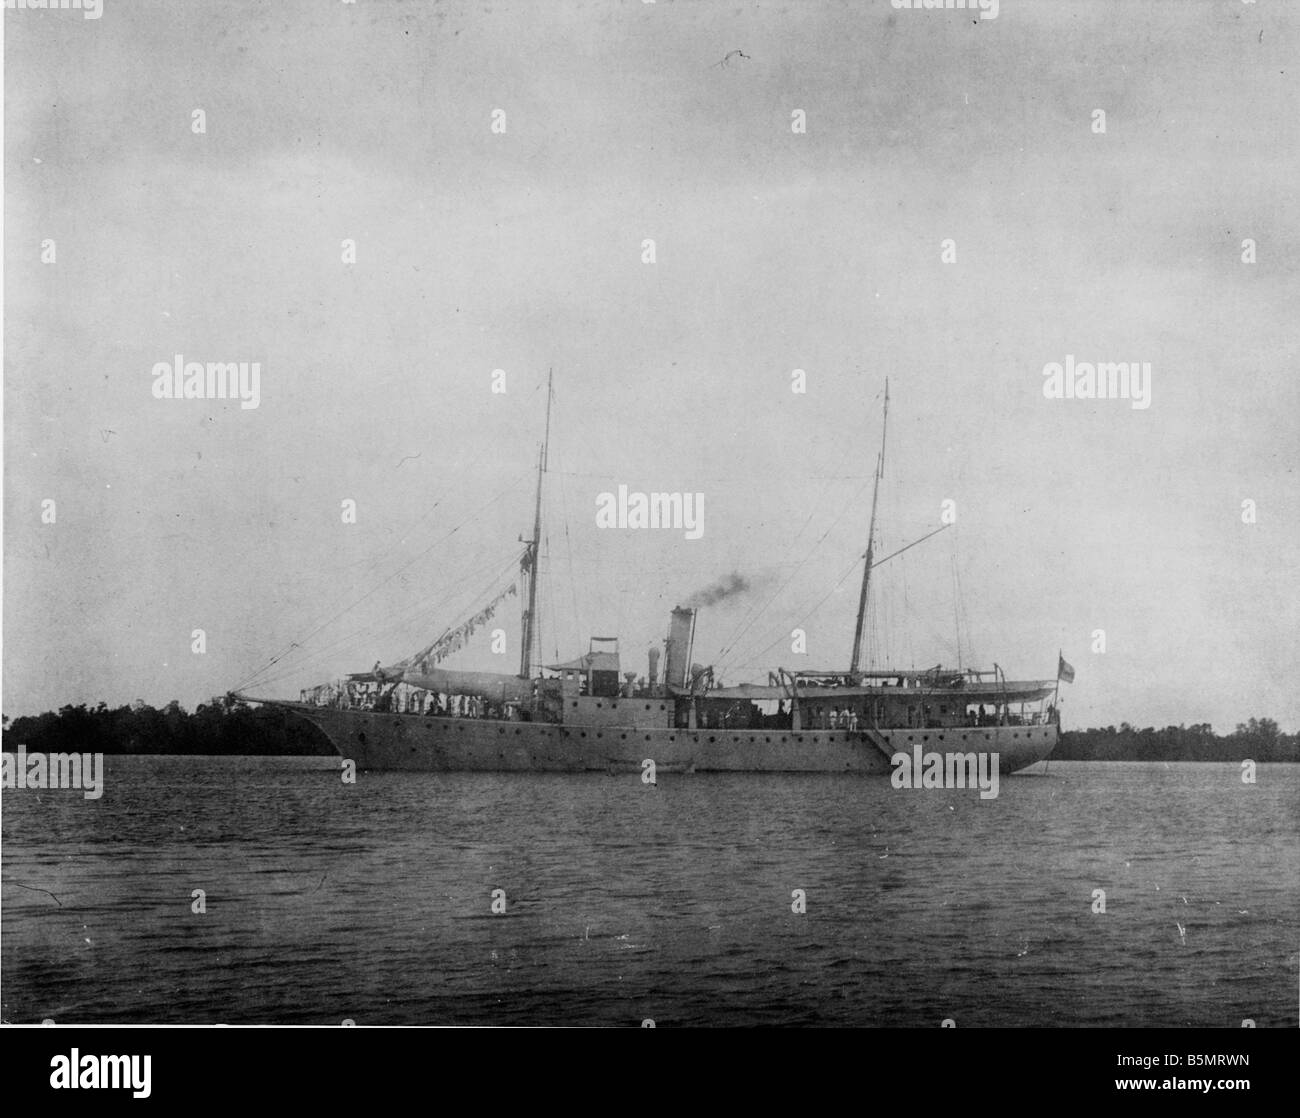 S M S Moewe nella foto Rufidji German East Africa Tanzania ora come una colonia tedesca 1884 1920 S M S Moewe nella foto Rufidji 1914 Foto Stock